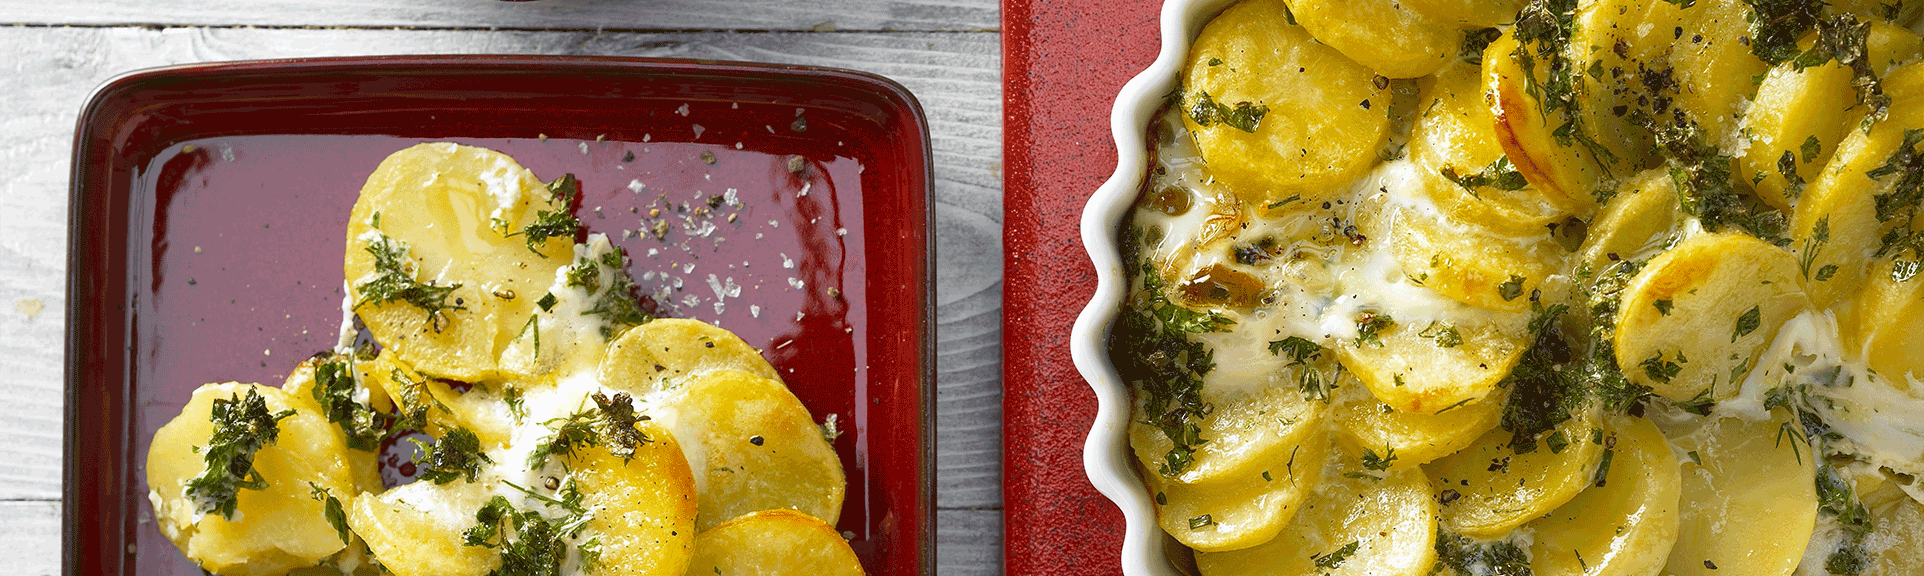 Headerabbildung des Rezeptes Kräuter-Kartoffel-Tarte mit Buttermilchquark